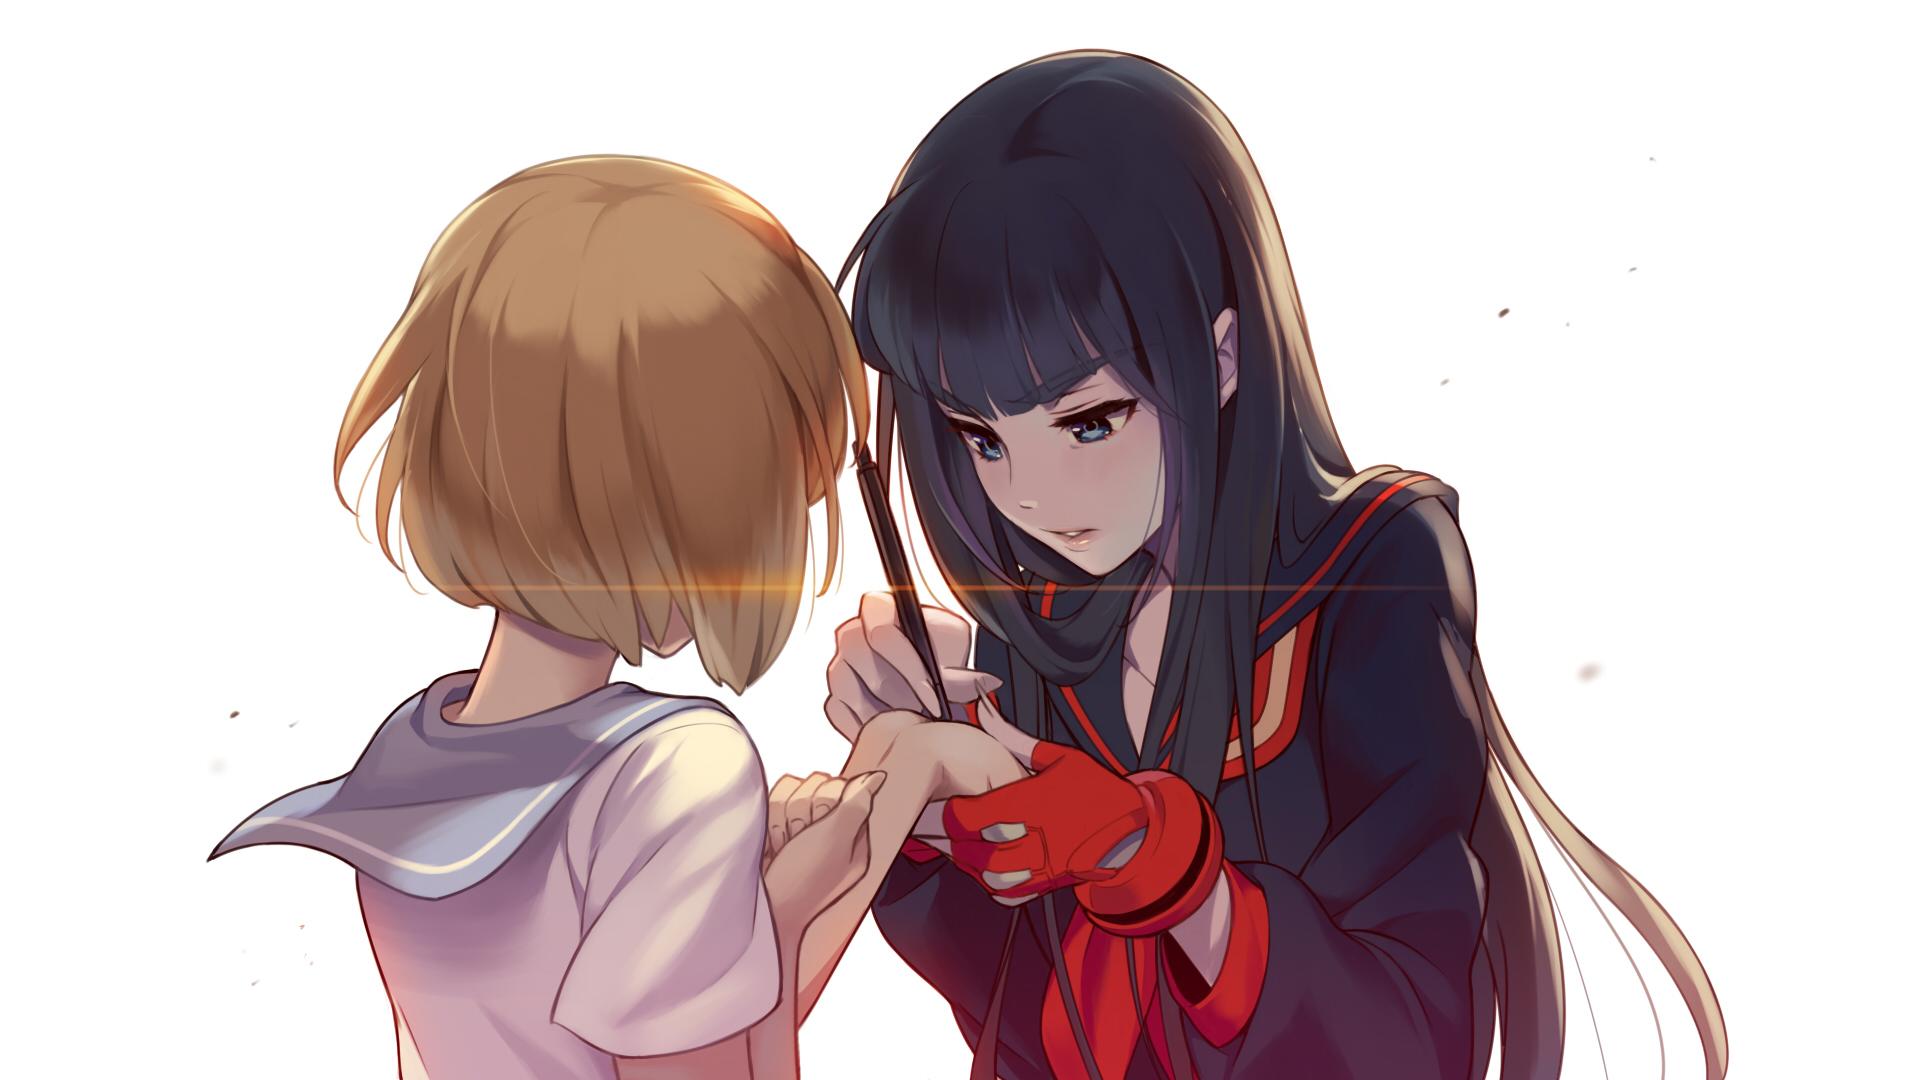 mako mankanshoku and kiryuuin kiryuin satsuki girl kill la kill hd 1920x1080